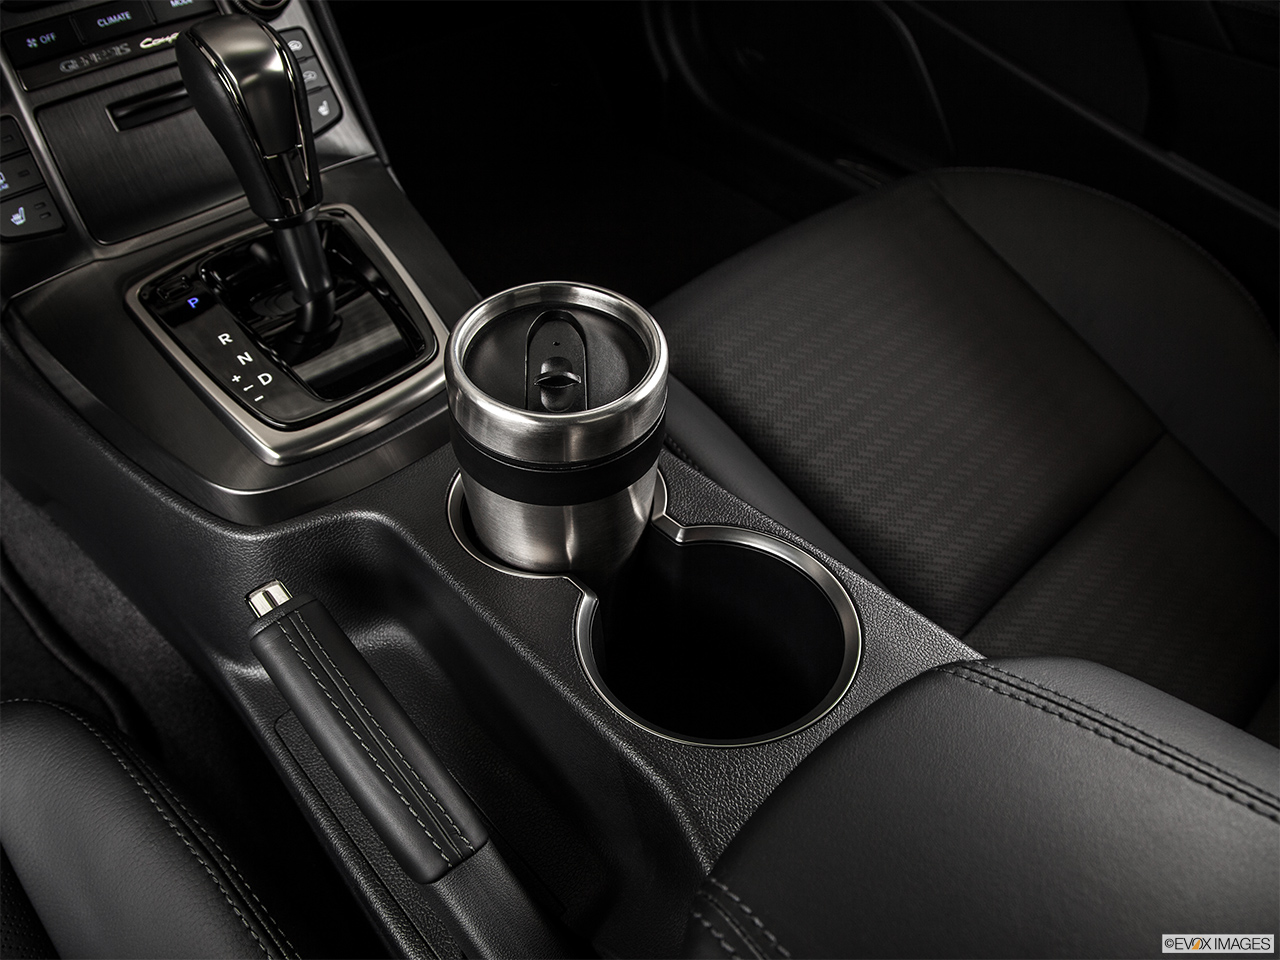 2015 Hyundai Genesis Coupe 2 Door 3 8l Manual R Spec Cup